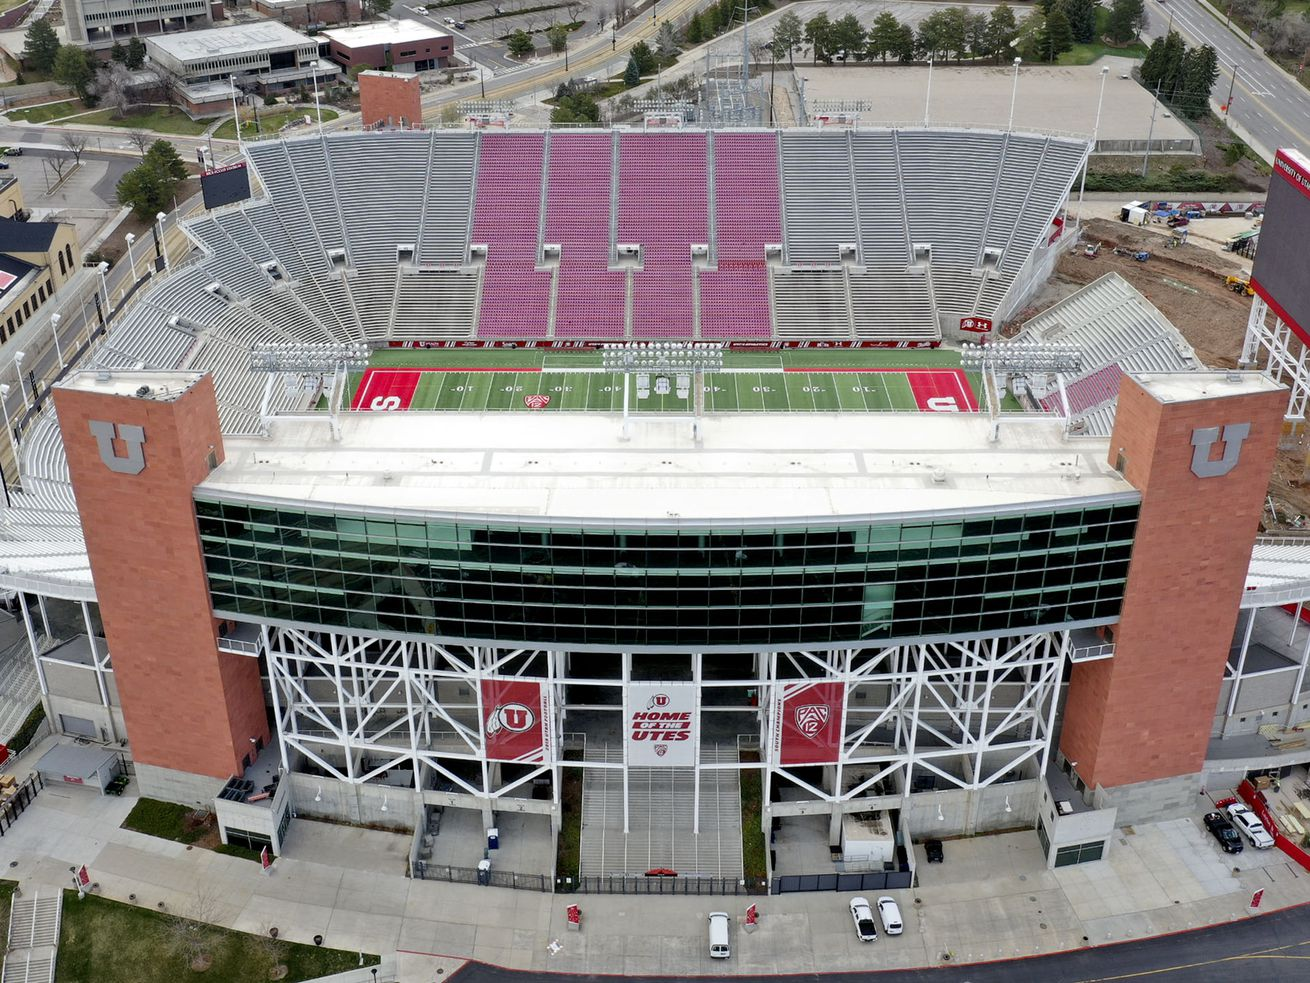 View of Rice-Eccles Stadium in Salt Lake City